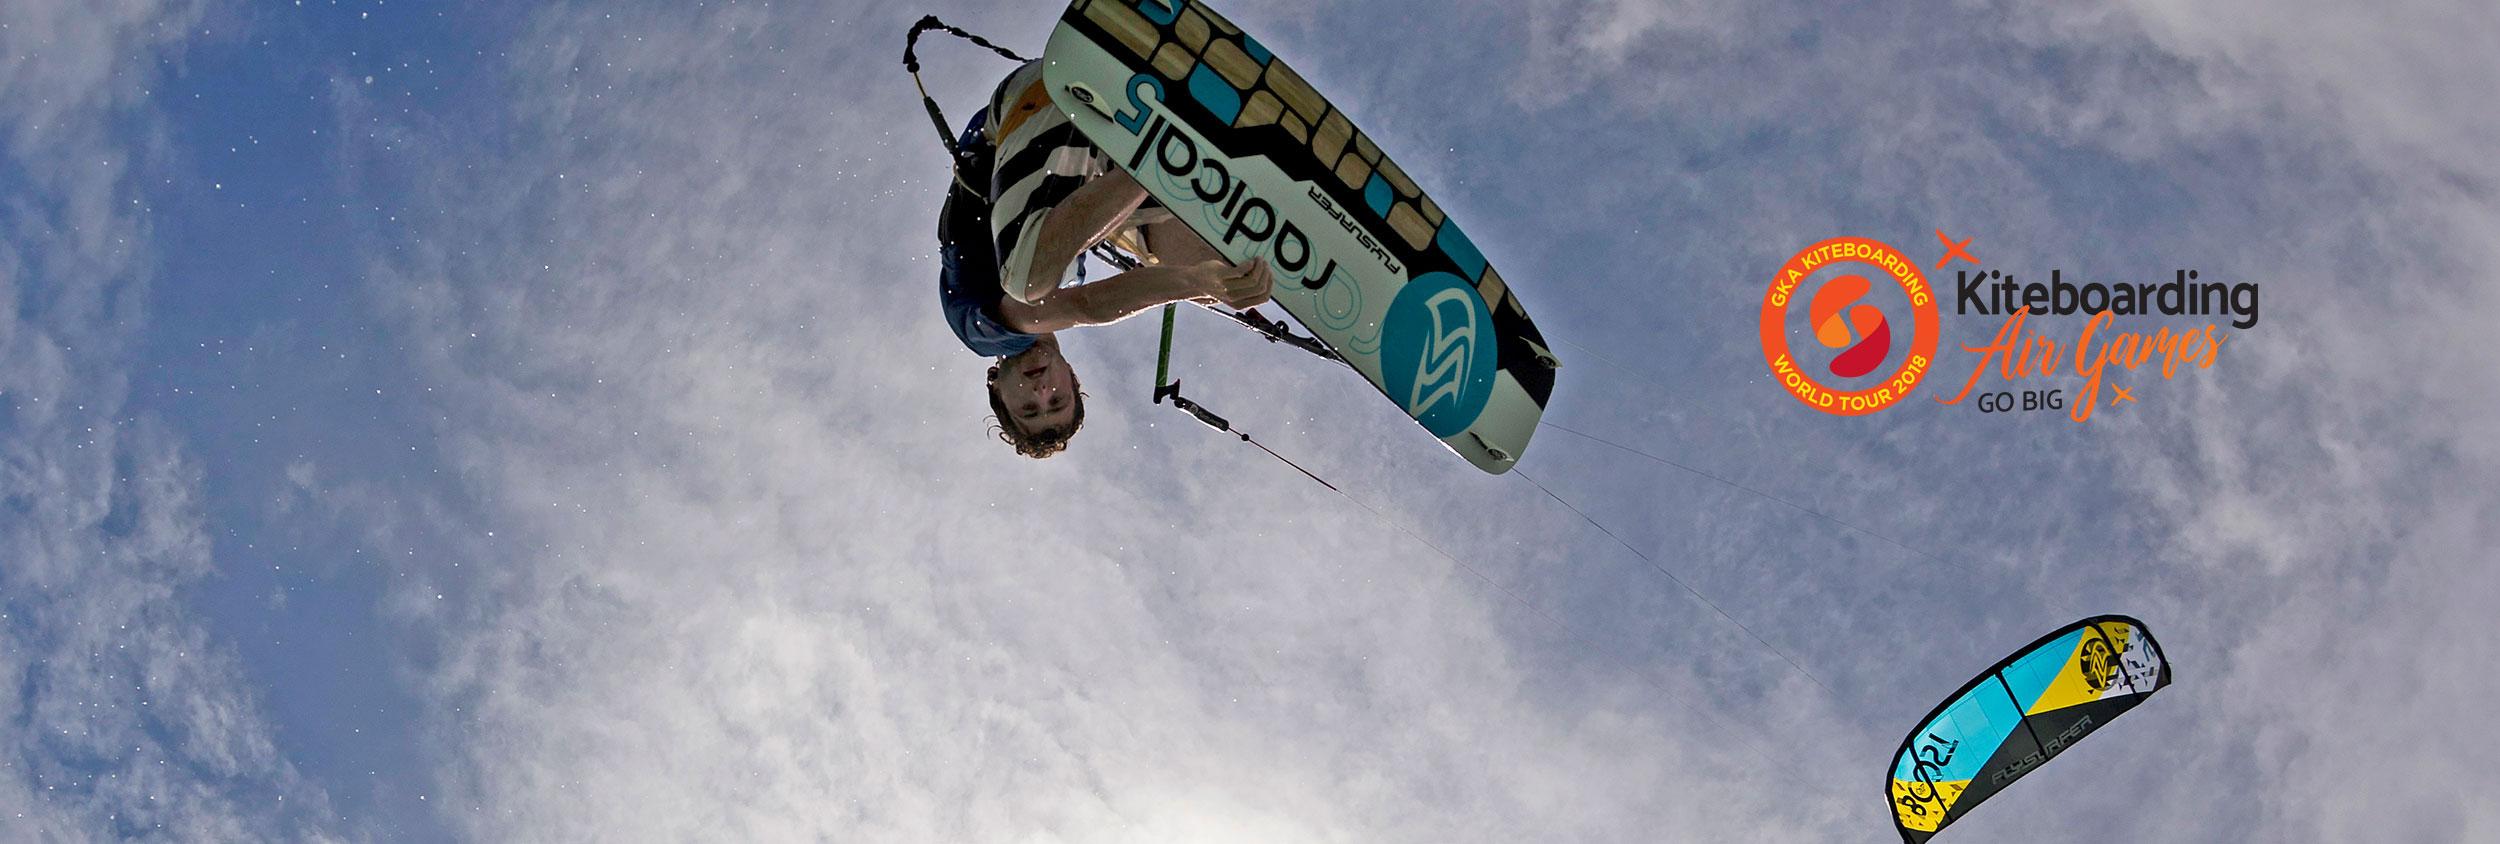 GKA Kiteboarding World Tour launch!